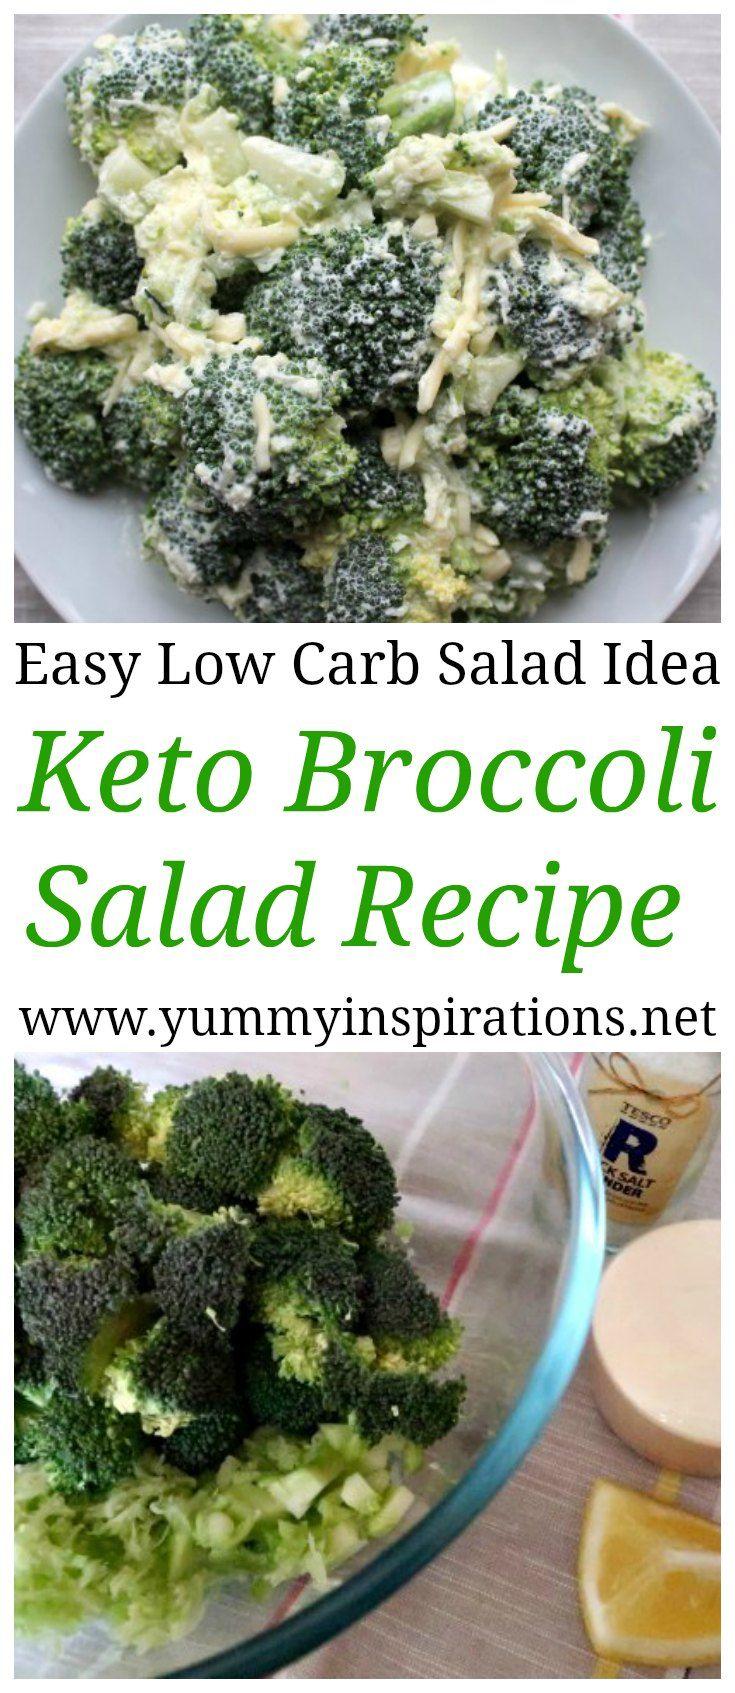 Broccoli Salad Recipe Low Carb